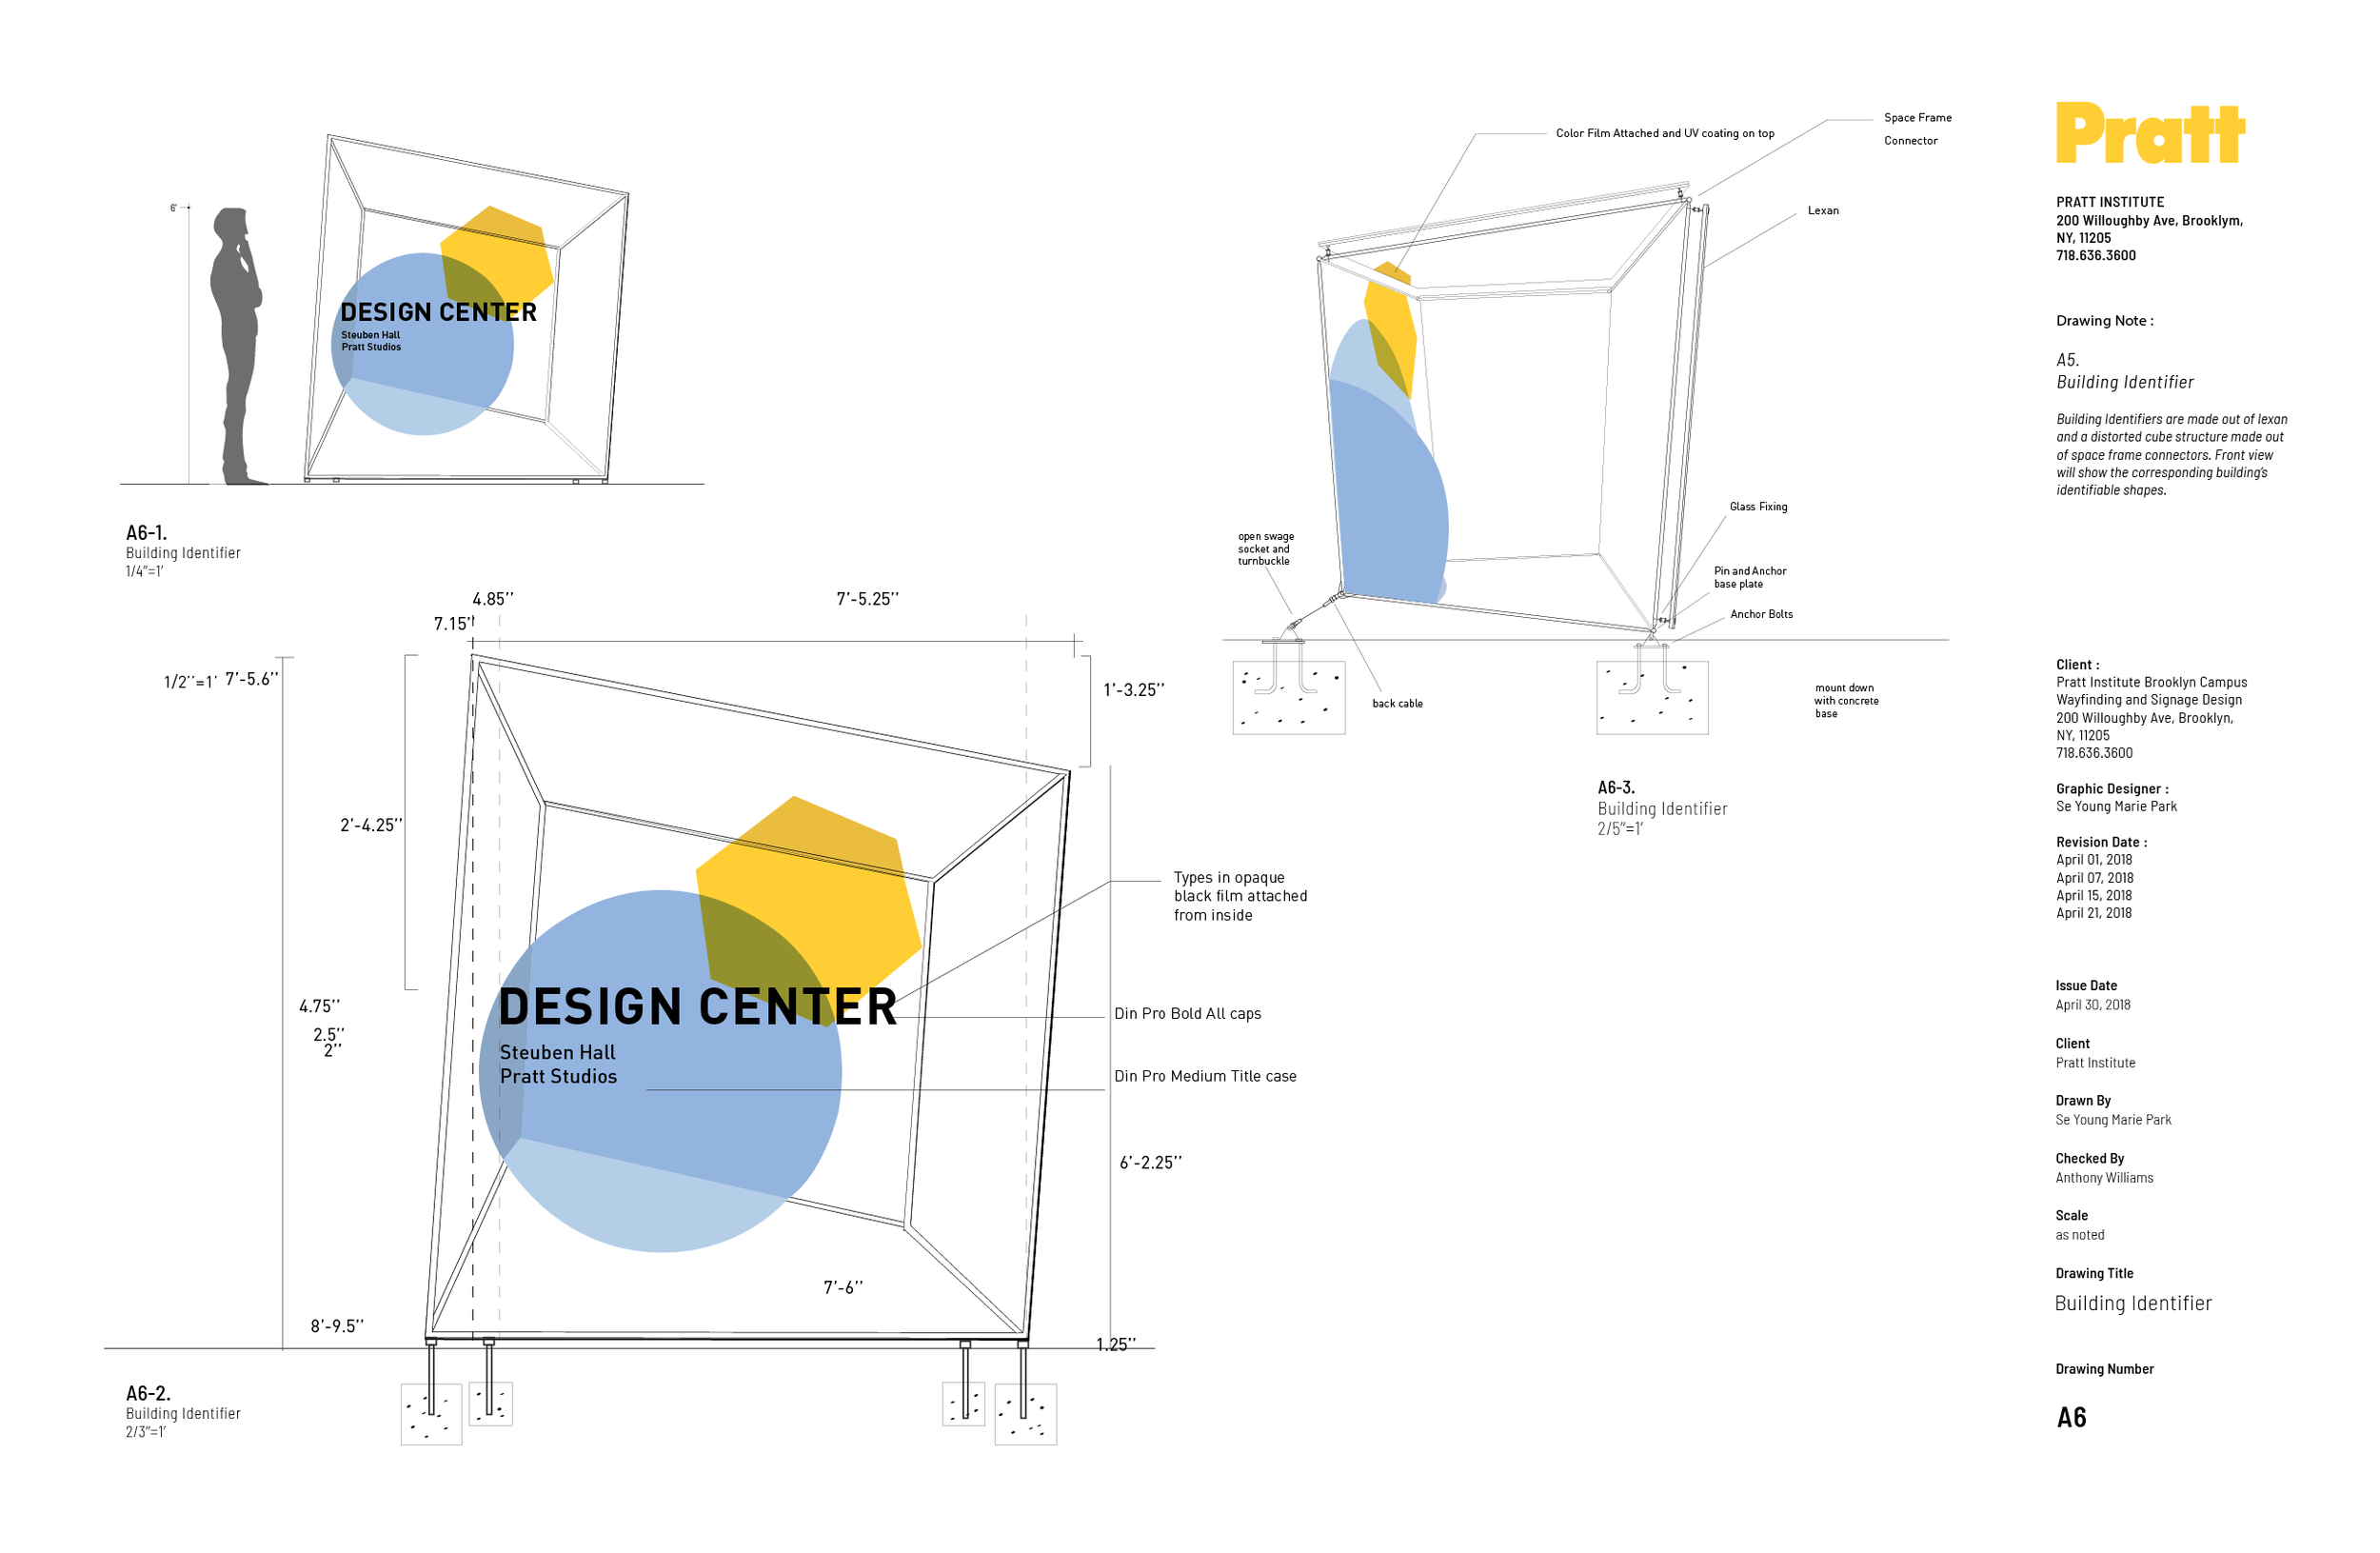 Pratt_Wayfinding_Signage_Design-07.png